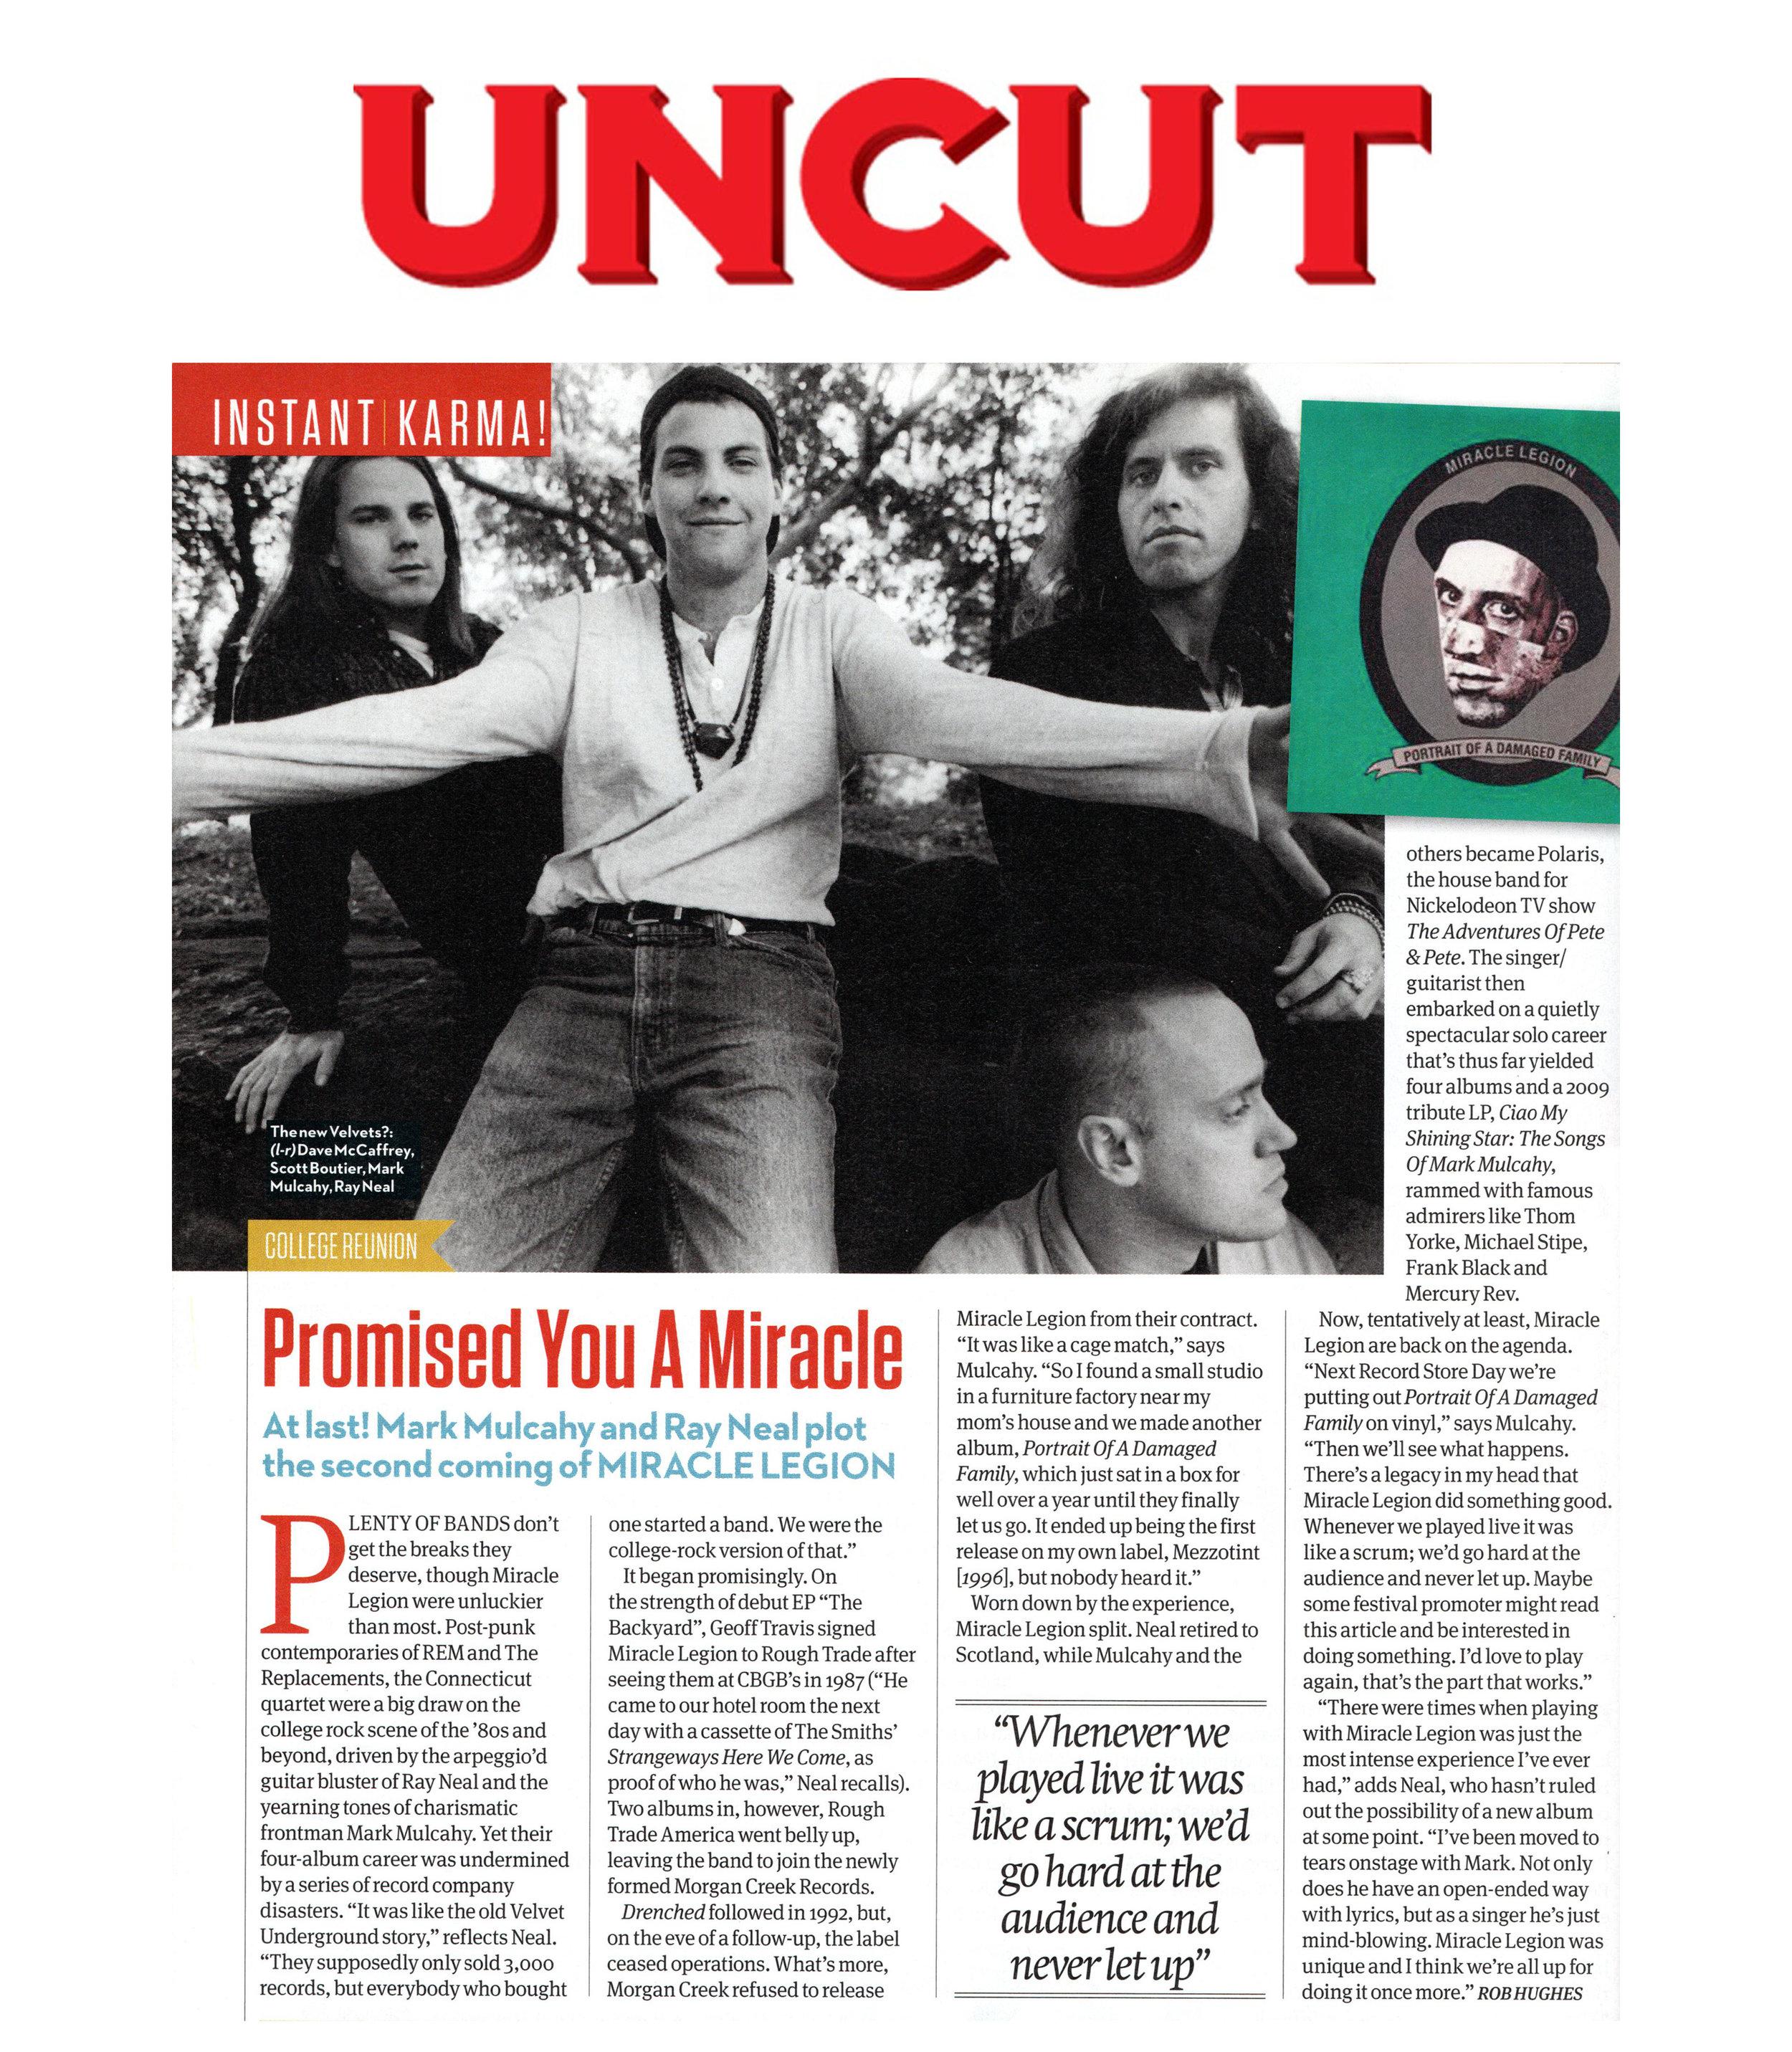 UNCUT Magazine (UK) Instant Karma! Feature - January 2016